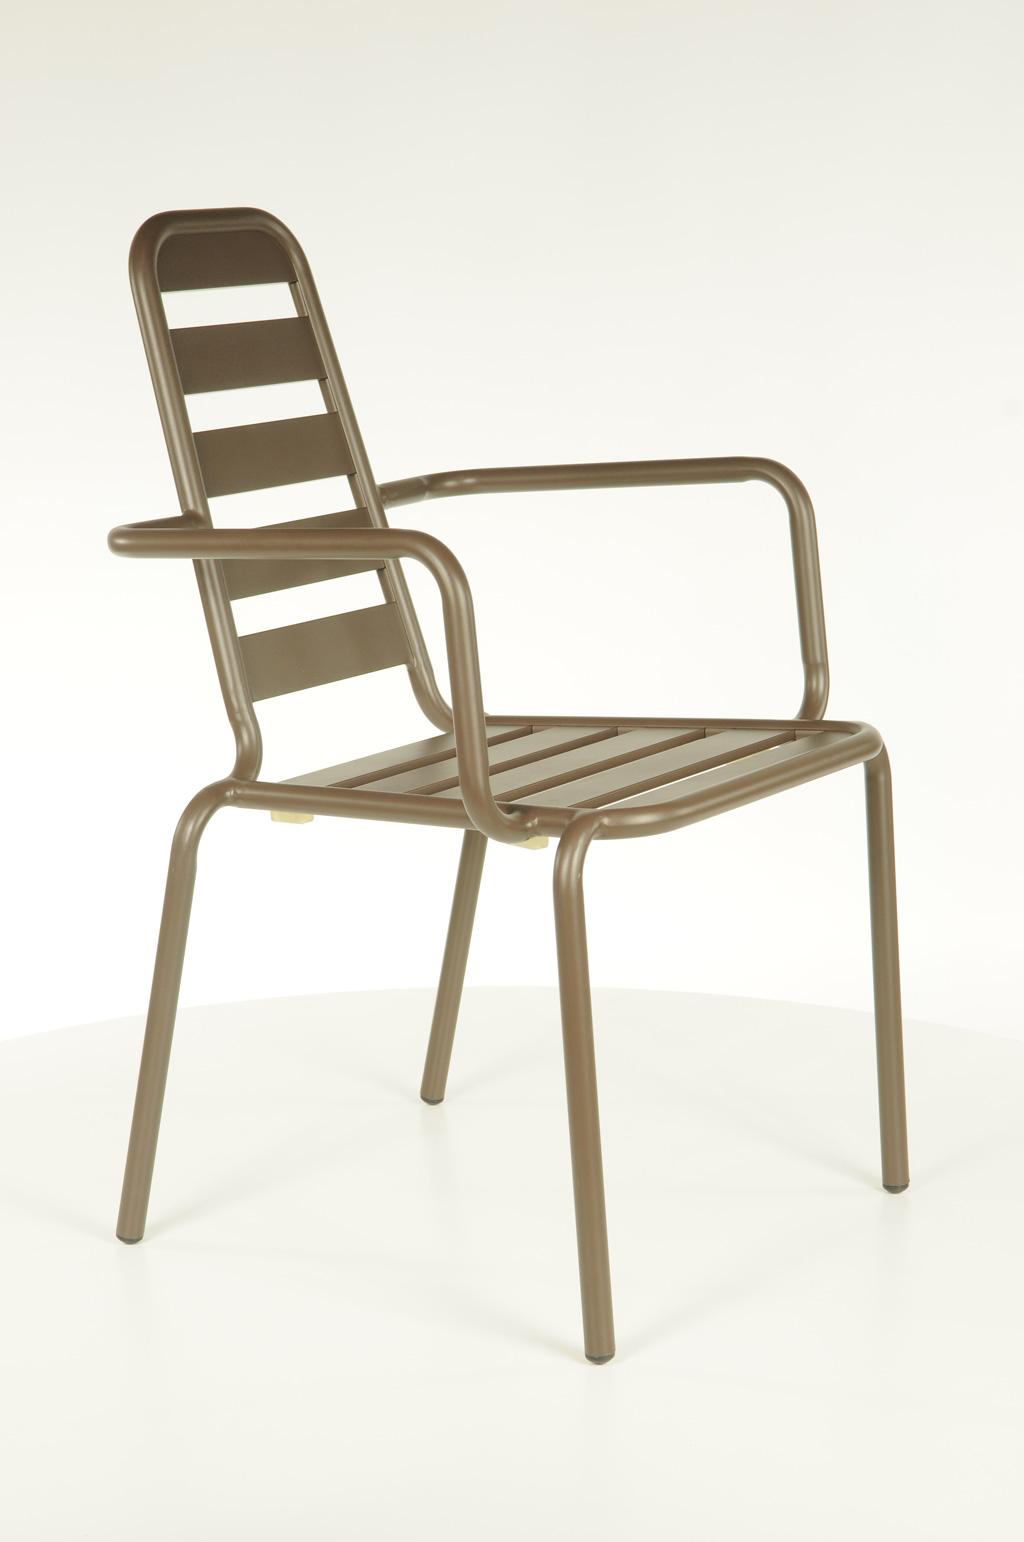 fauteuil menu rouille oceo sun mobilier. Black Bedroom Furniture Sets. Home Design Ideas